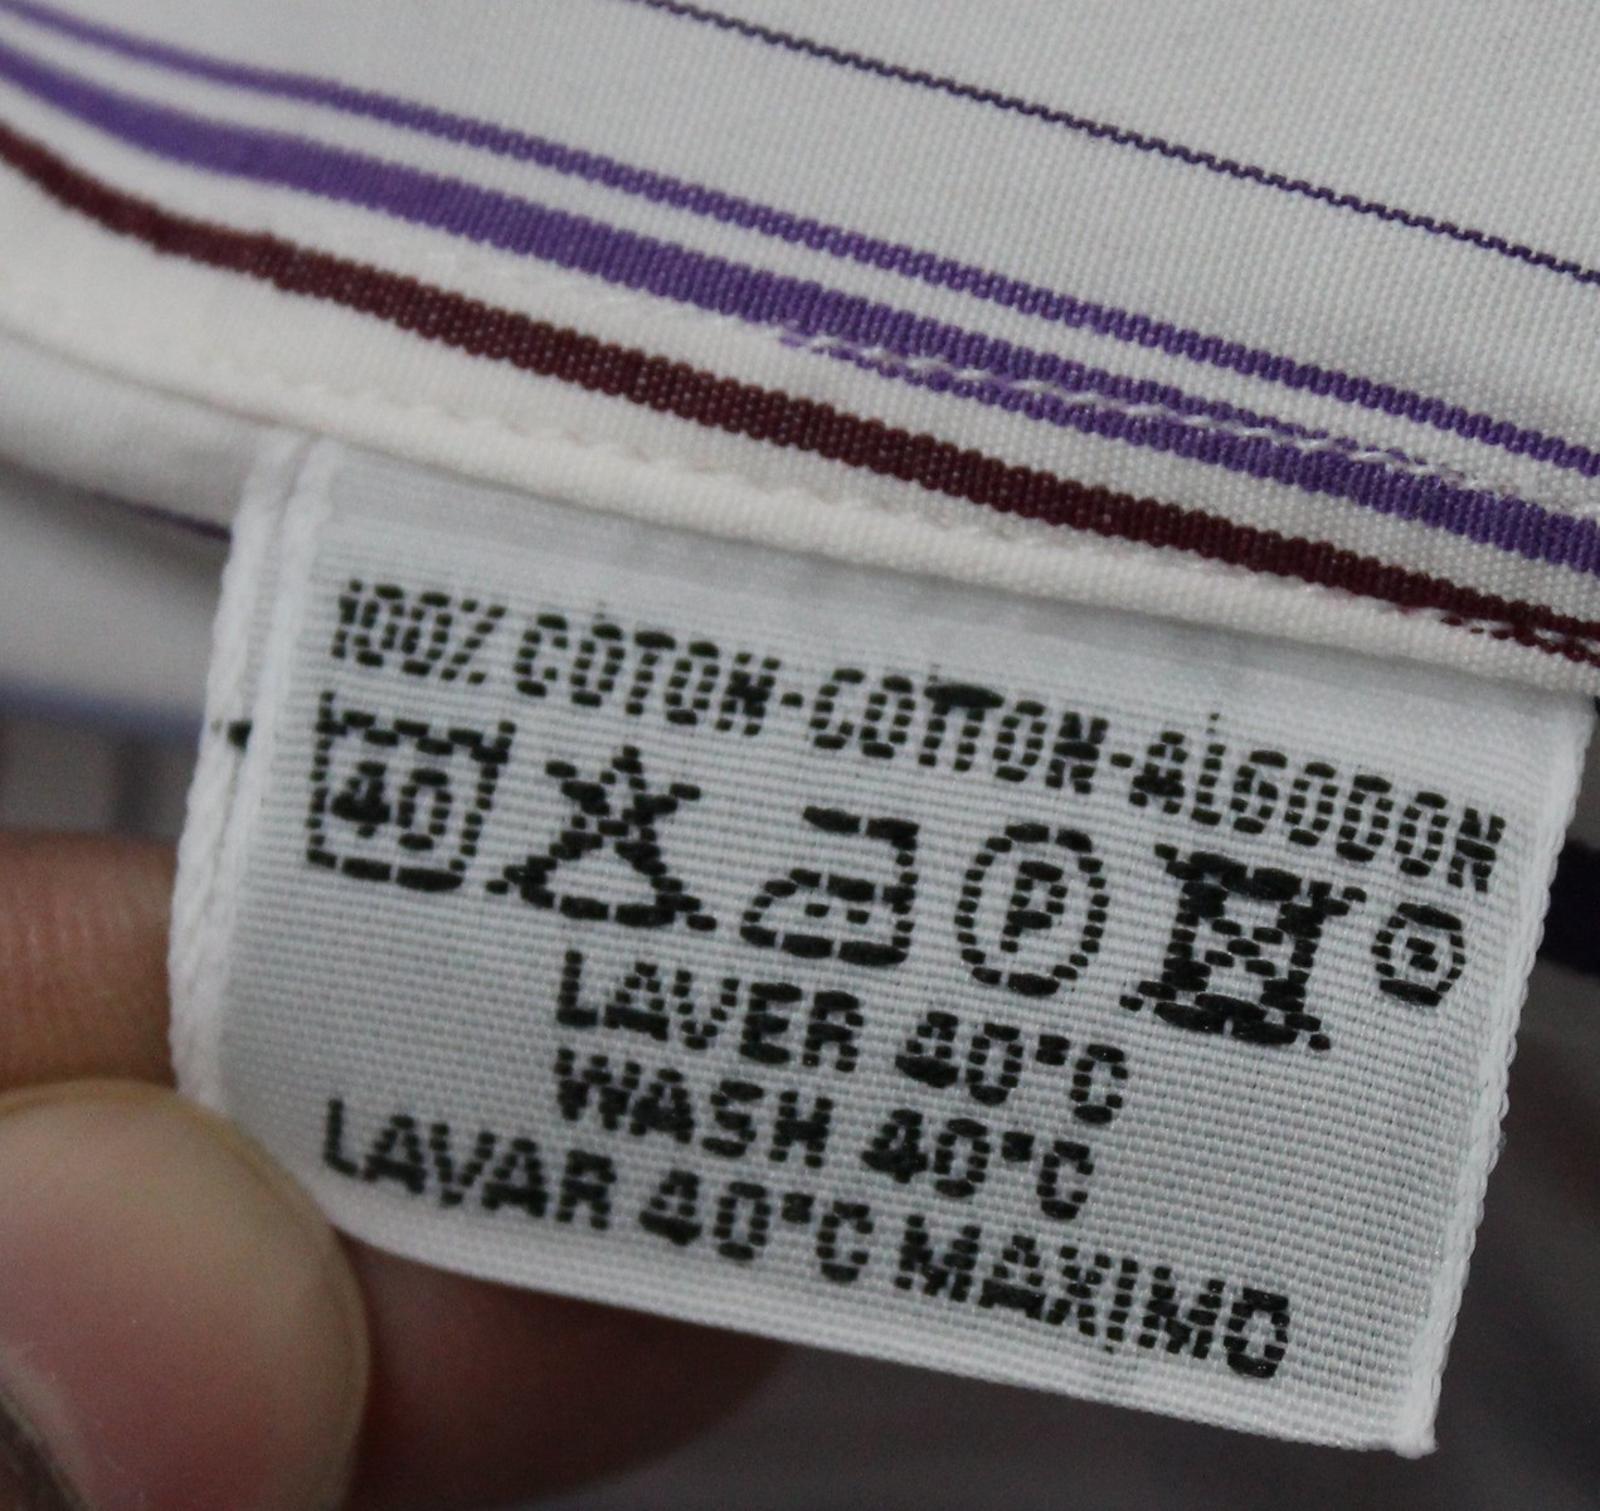 Hermes-para-hombre-Multi-Color-a-rayas-de-algodon-camisa-de-mangas-largas-cuello-16-5-034-42cm miniatura 10